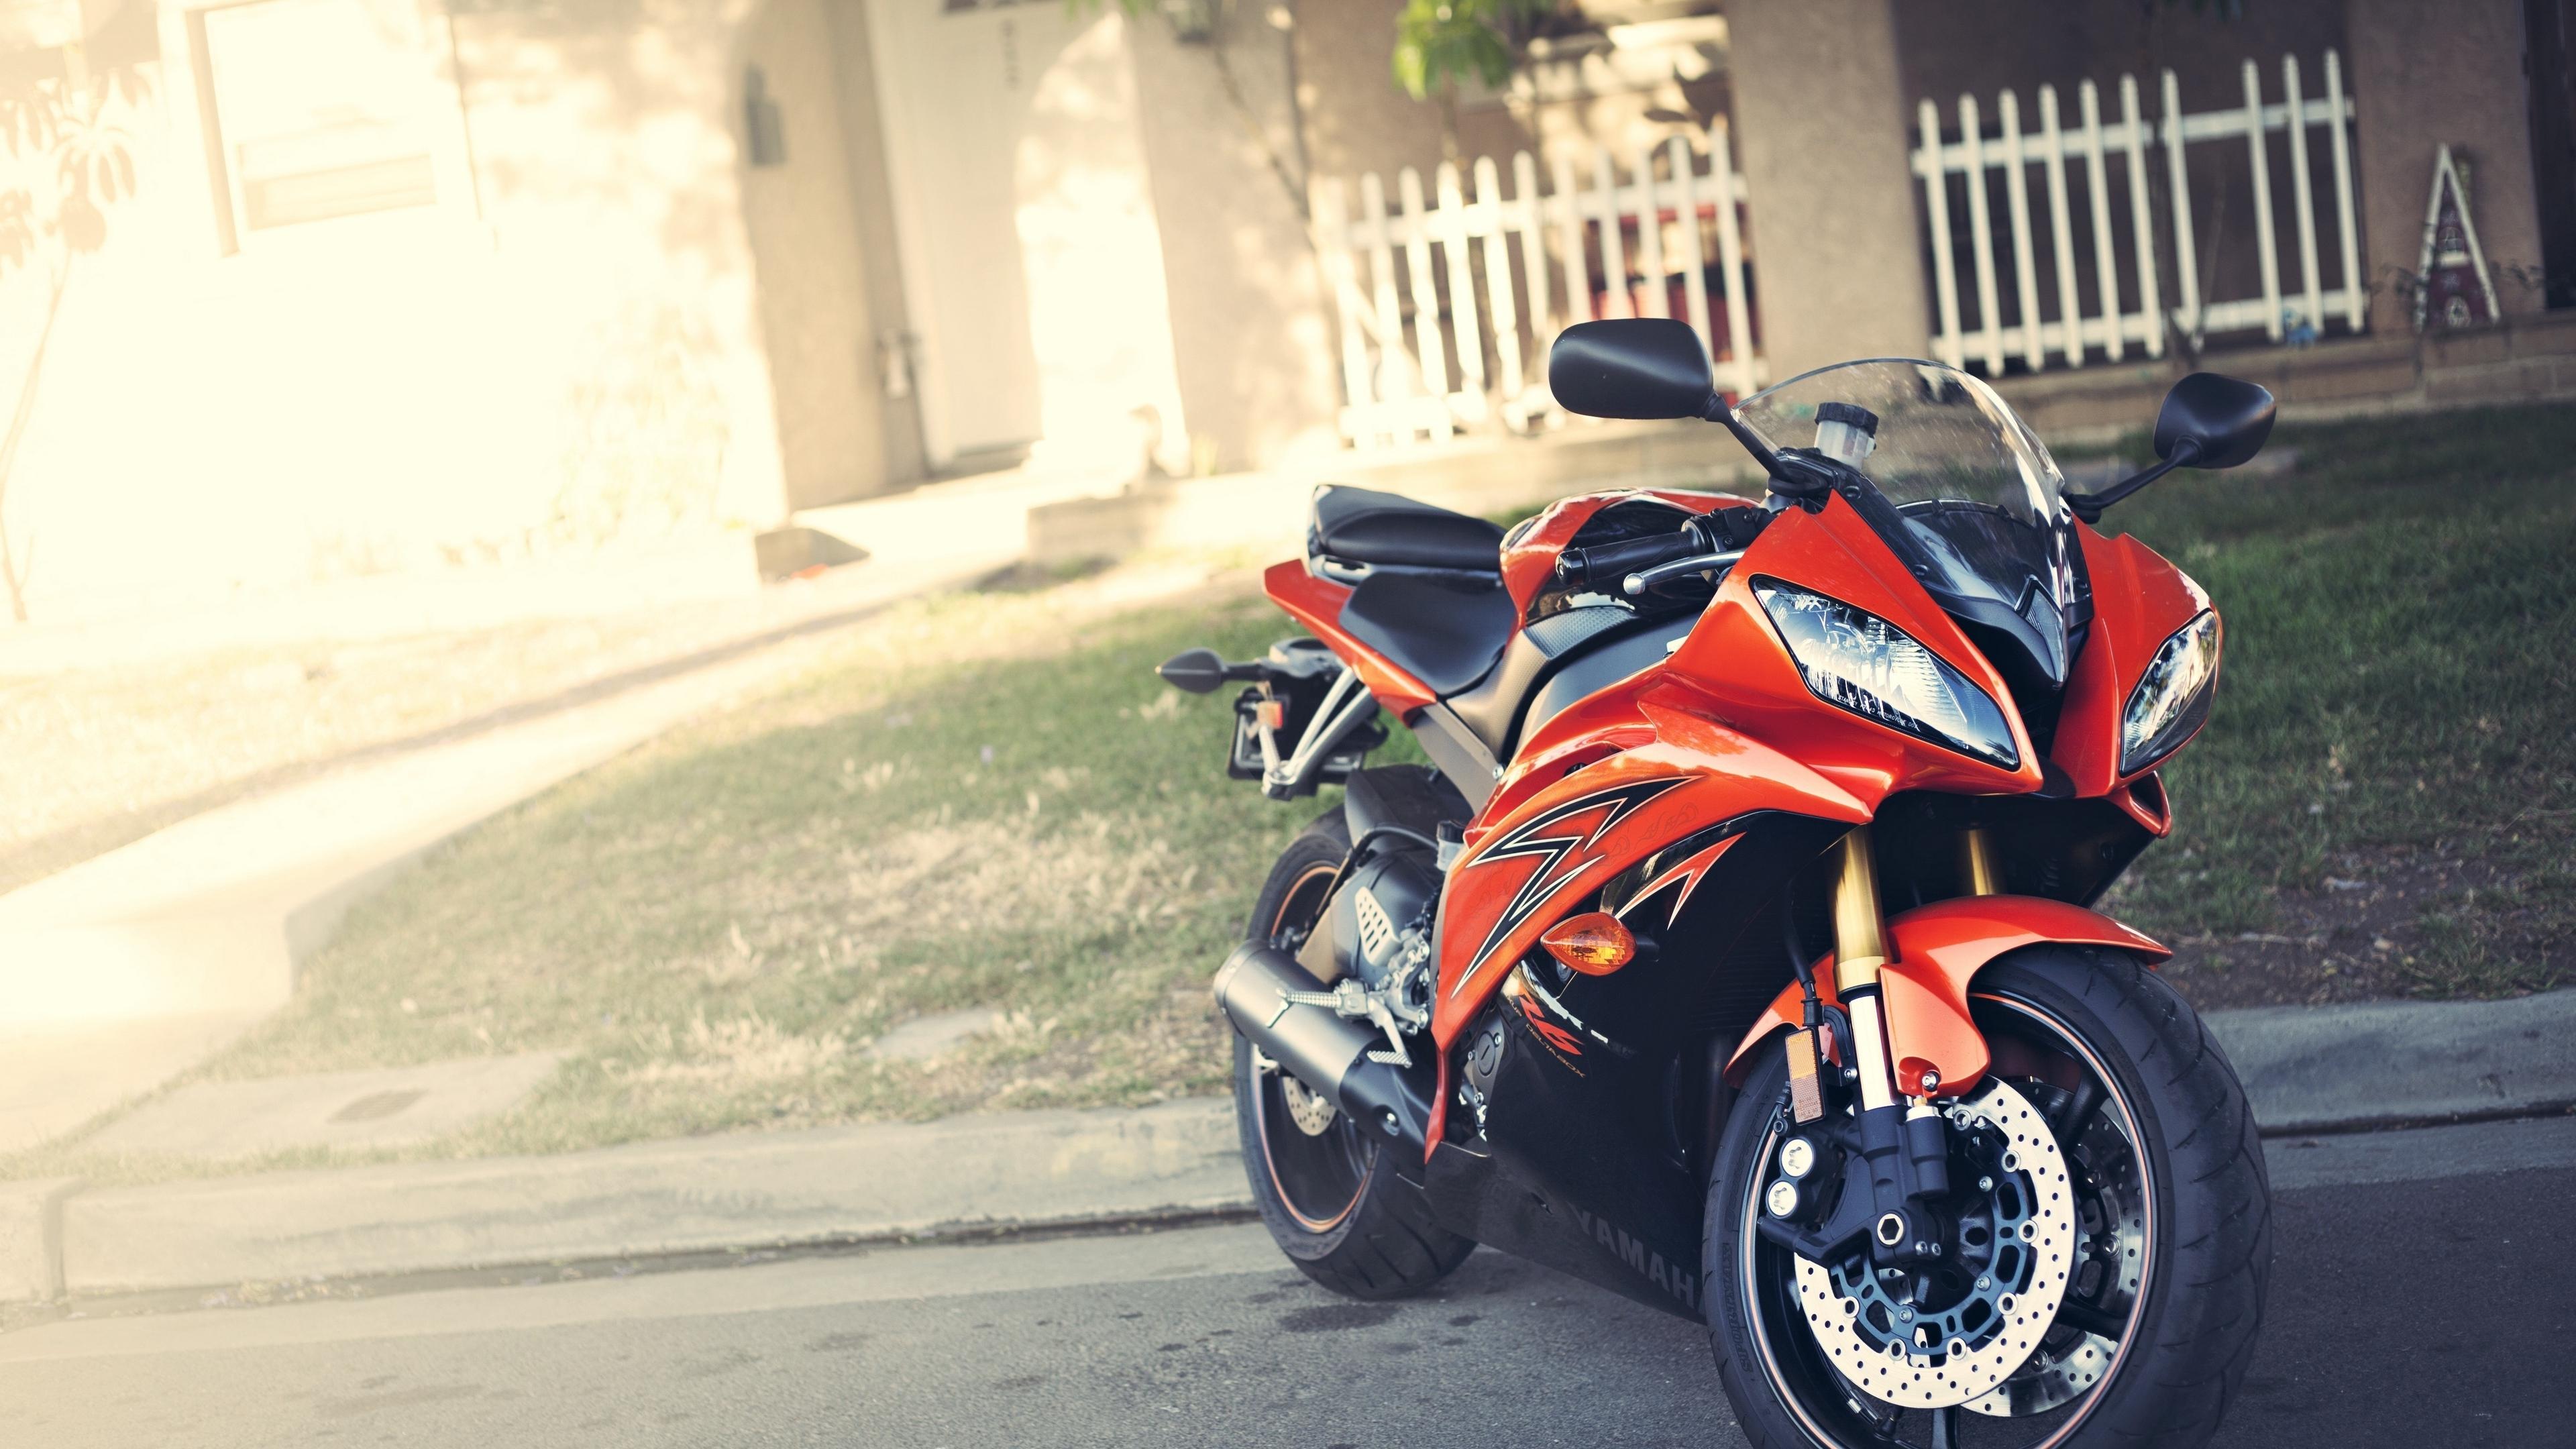 yamaha yzf r6 red motorcycle 4k 1536018898 - yamaha, yzf-r6, red, motorcycle 4k - yzf-r6, Yamaha, red